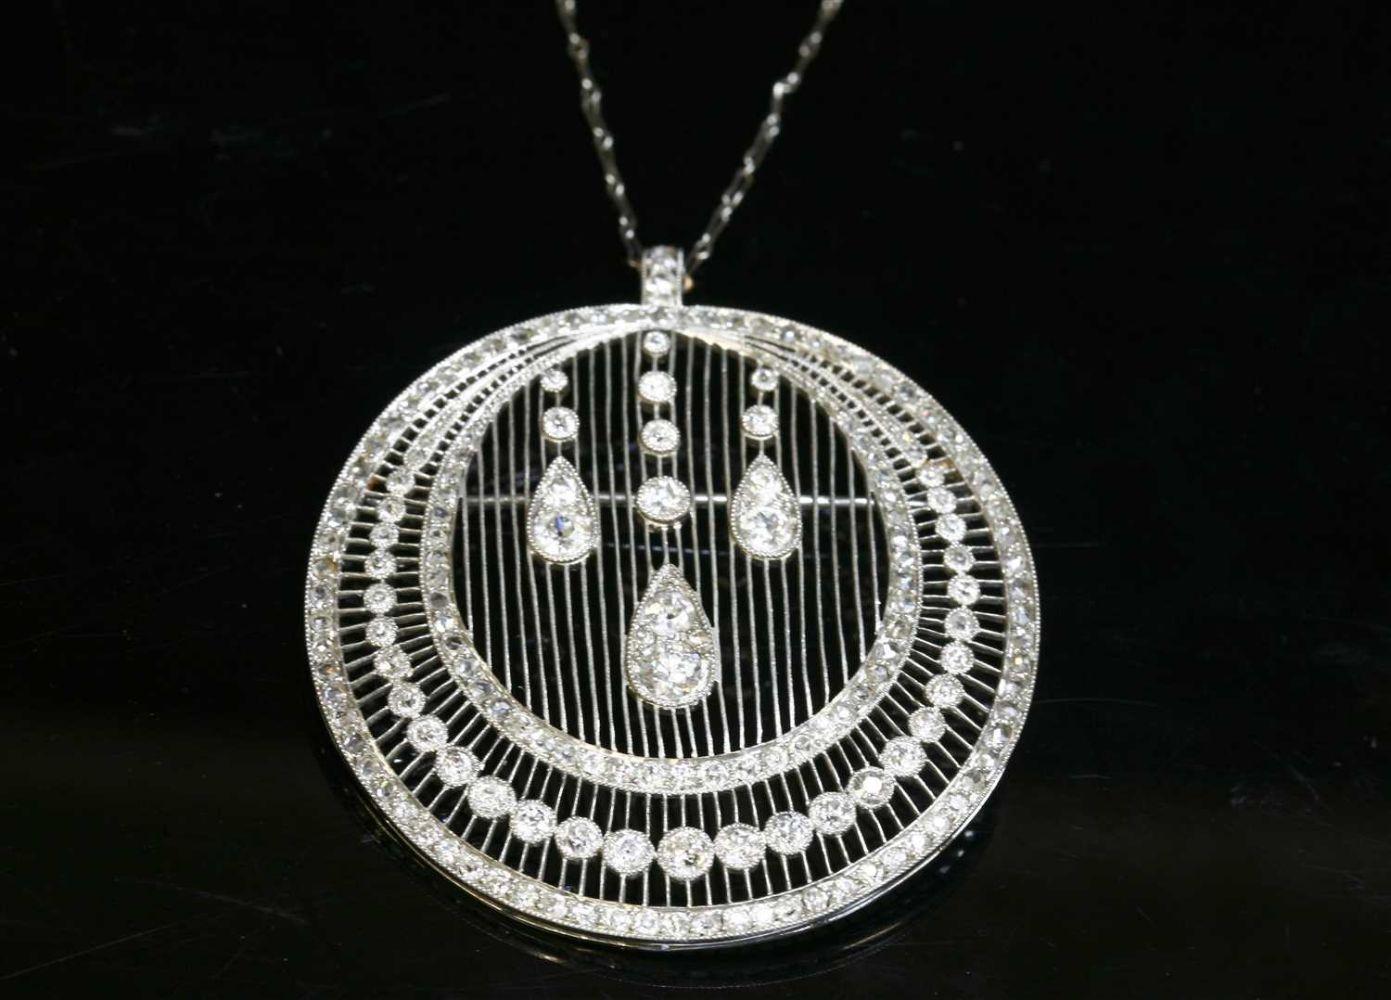 Fine Jewellery, Watches and Designer Handbags